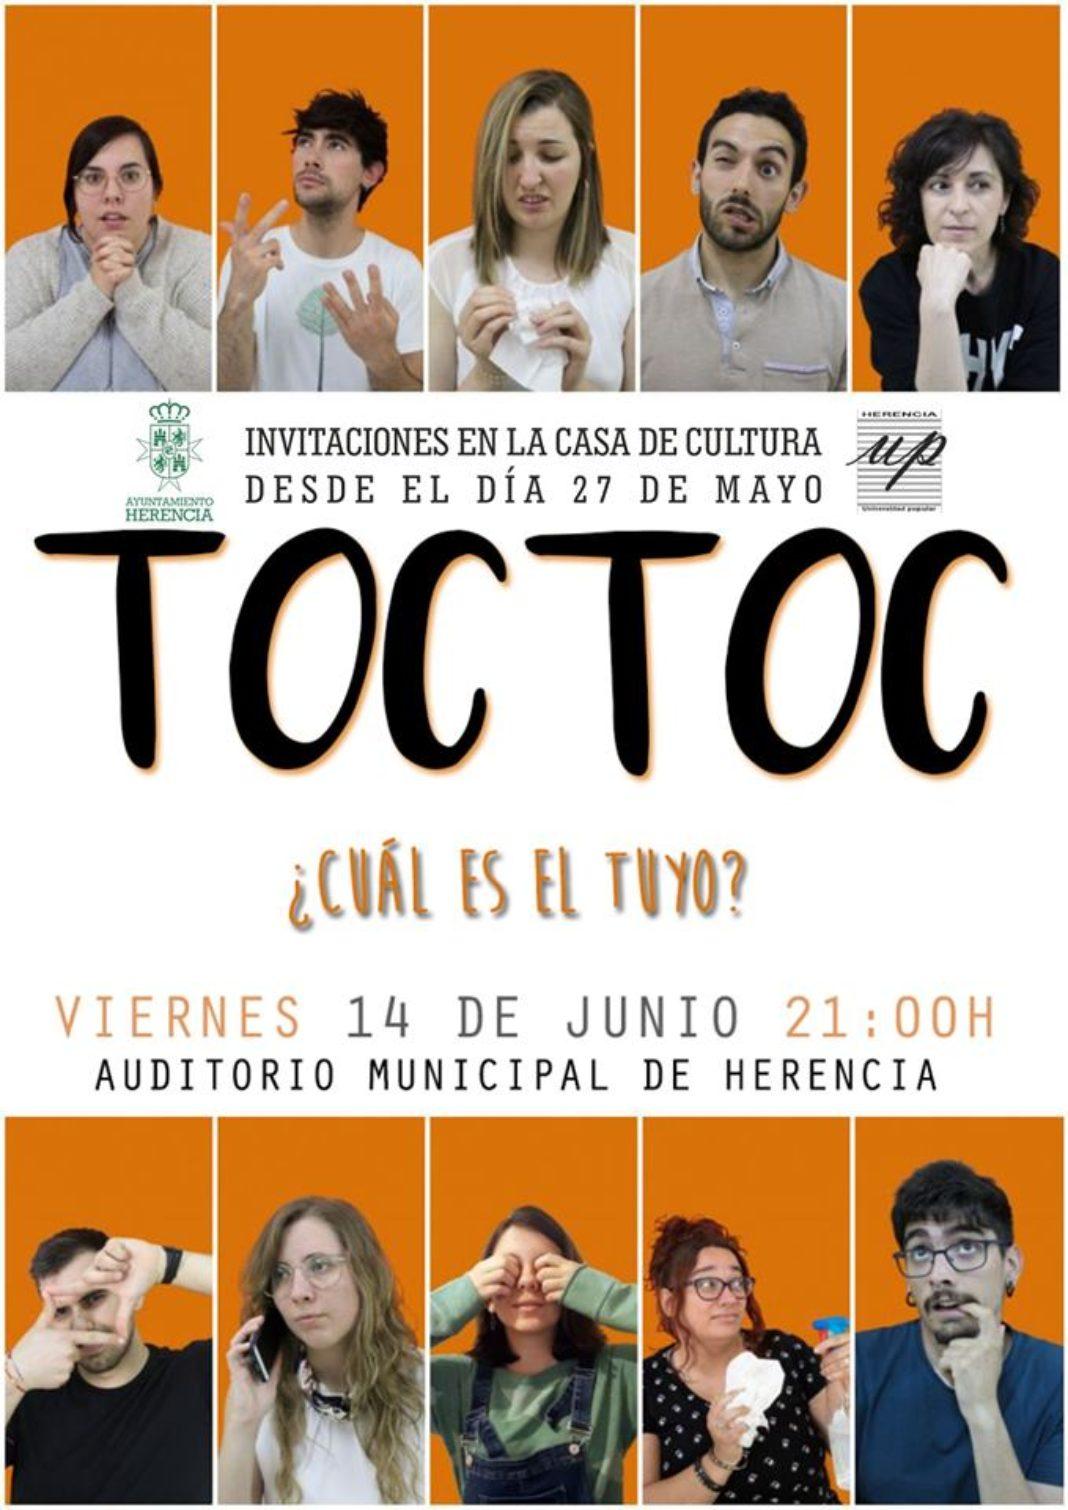 teatro adultos Universidad popular 1068x1510 - Toc Toc es la obra que el grupo de teatro de adultos de la Universidad Popular representará por su décimo cumpleaños